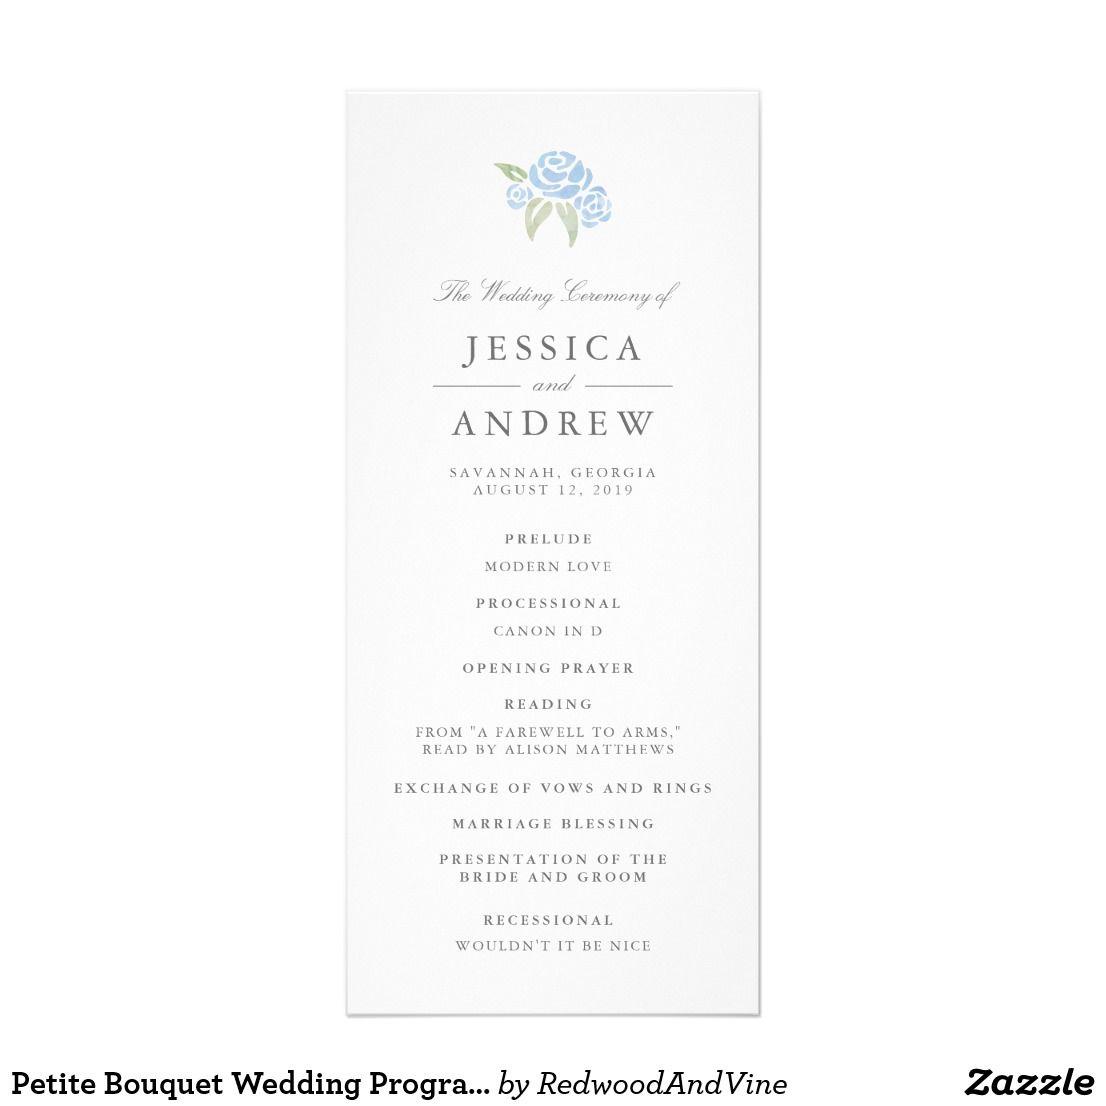 Petite Bouquet Wedding Program | Cornflower Blue | Wedding programs ...